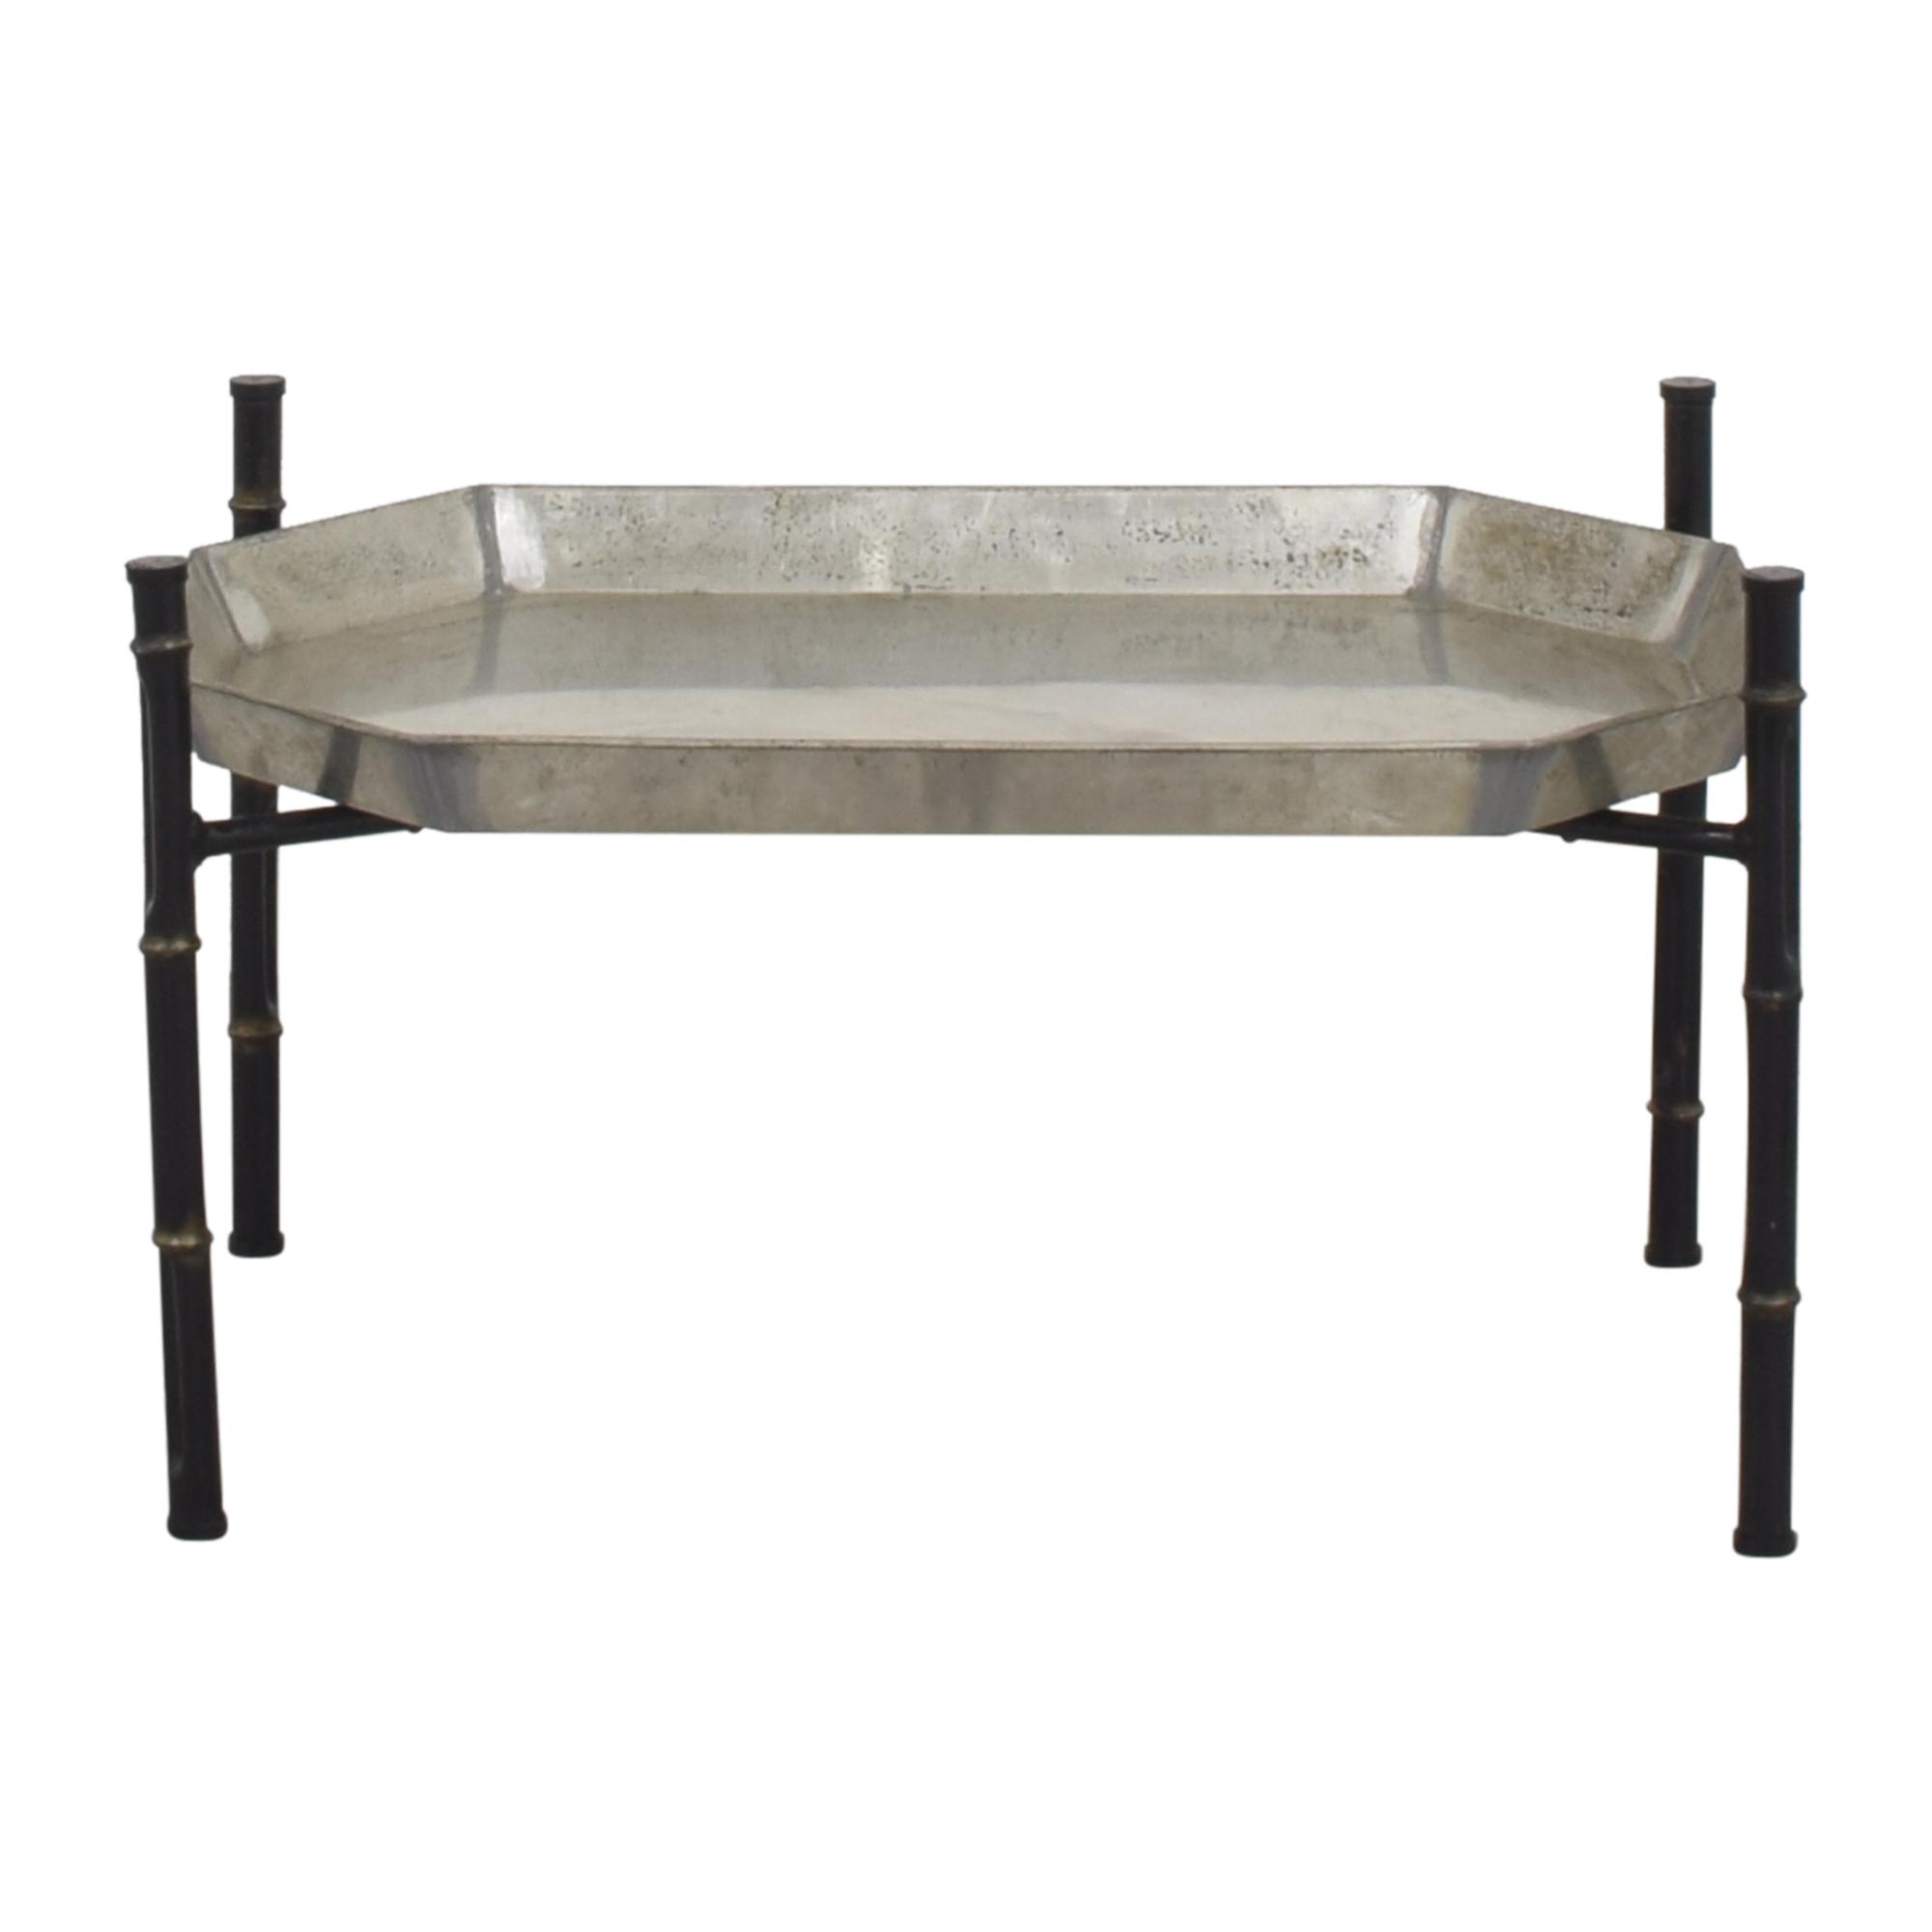 Custom Tray Coffee Table Coffee Tables